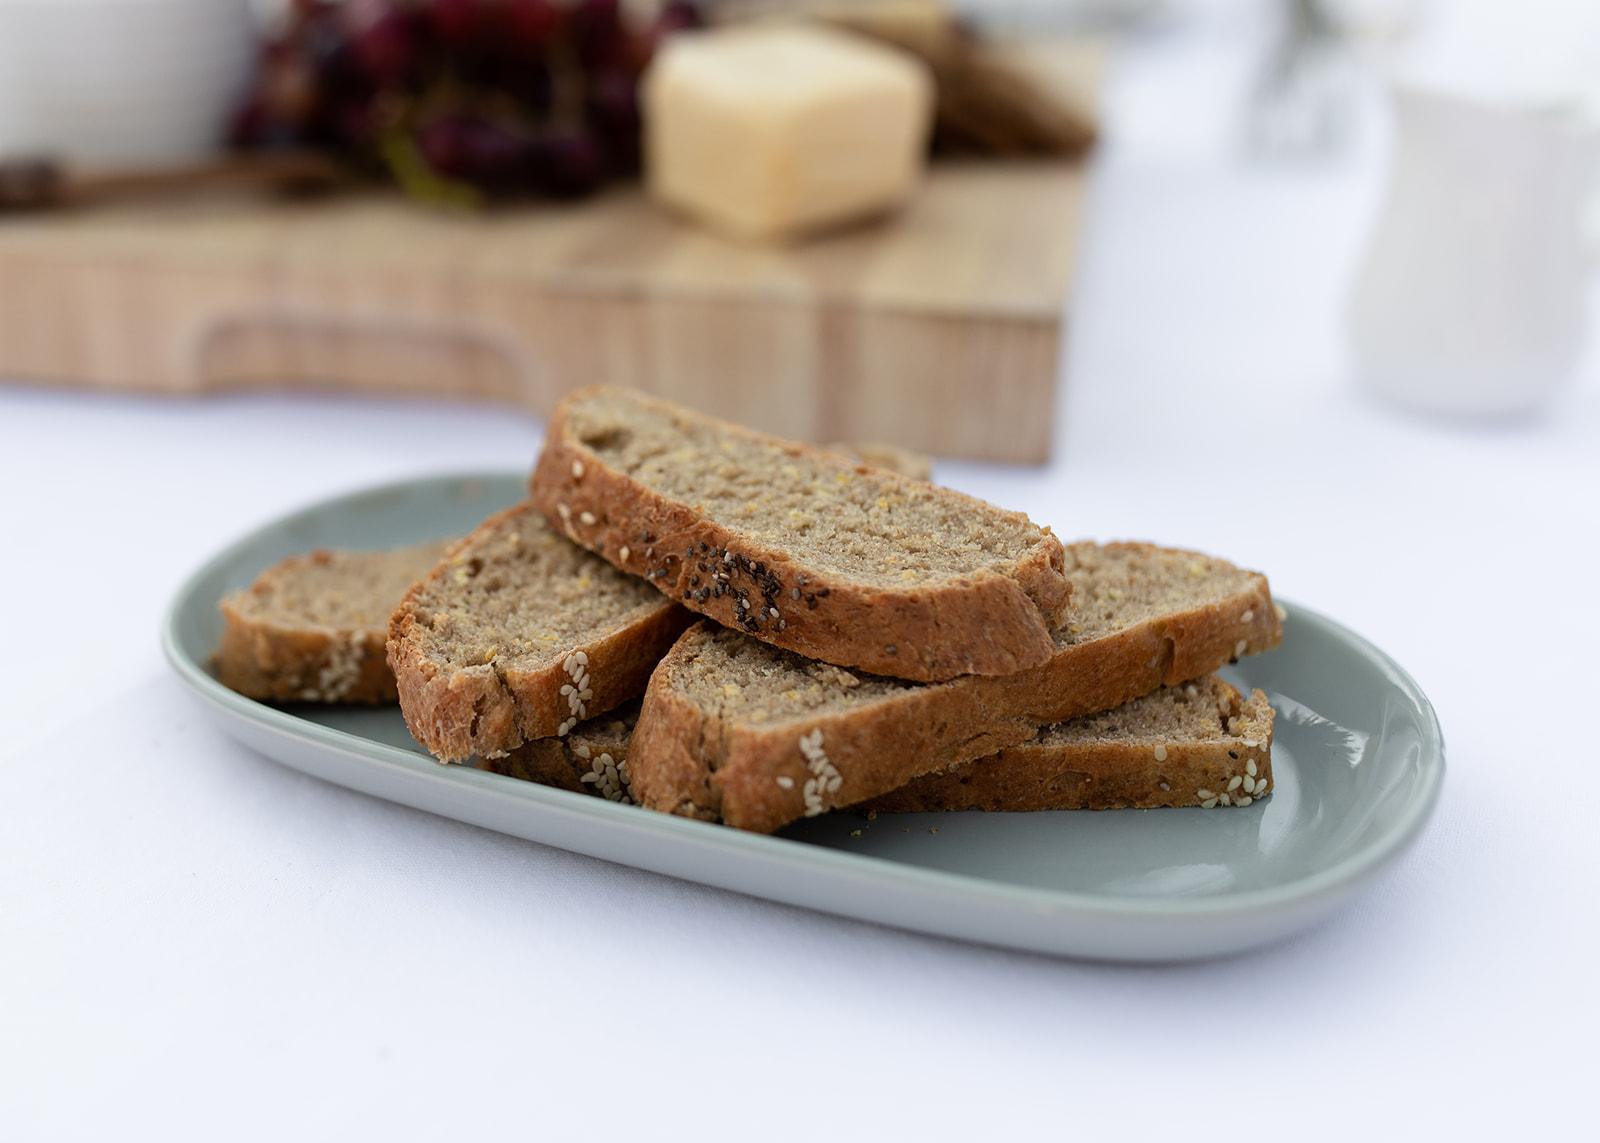 Lupin gluten free bread